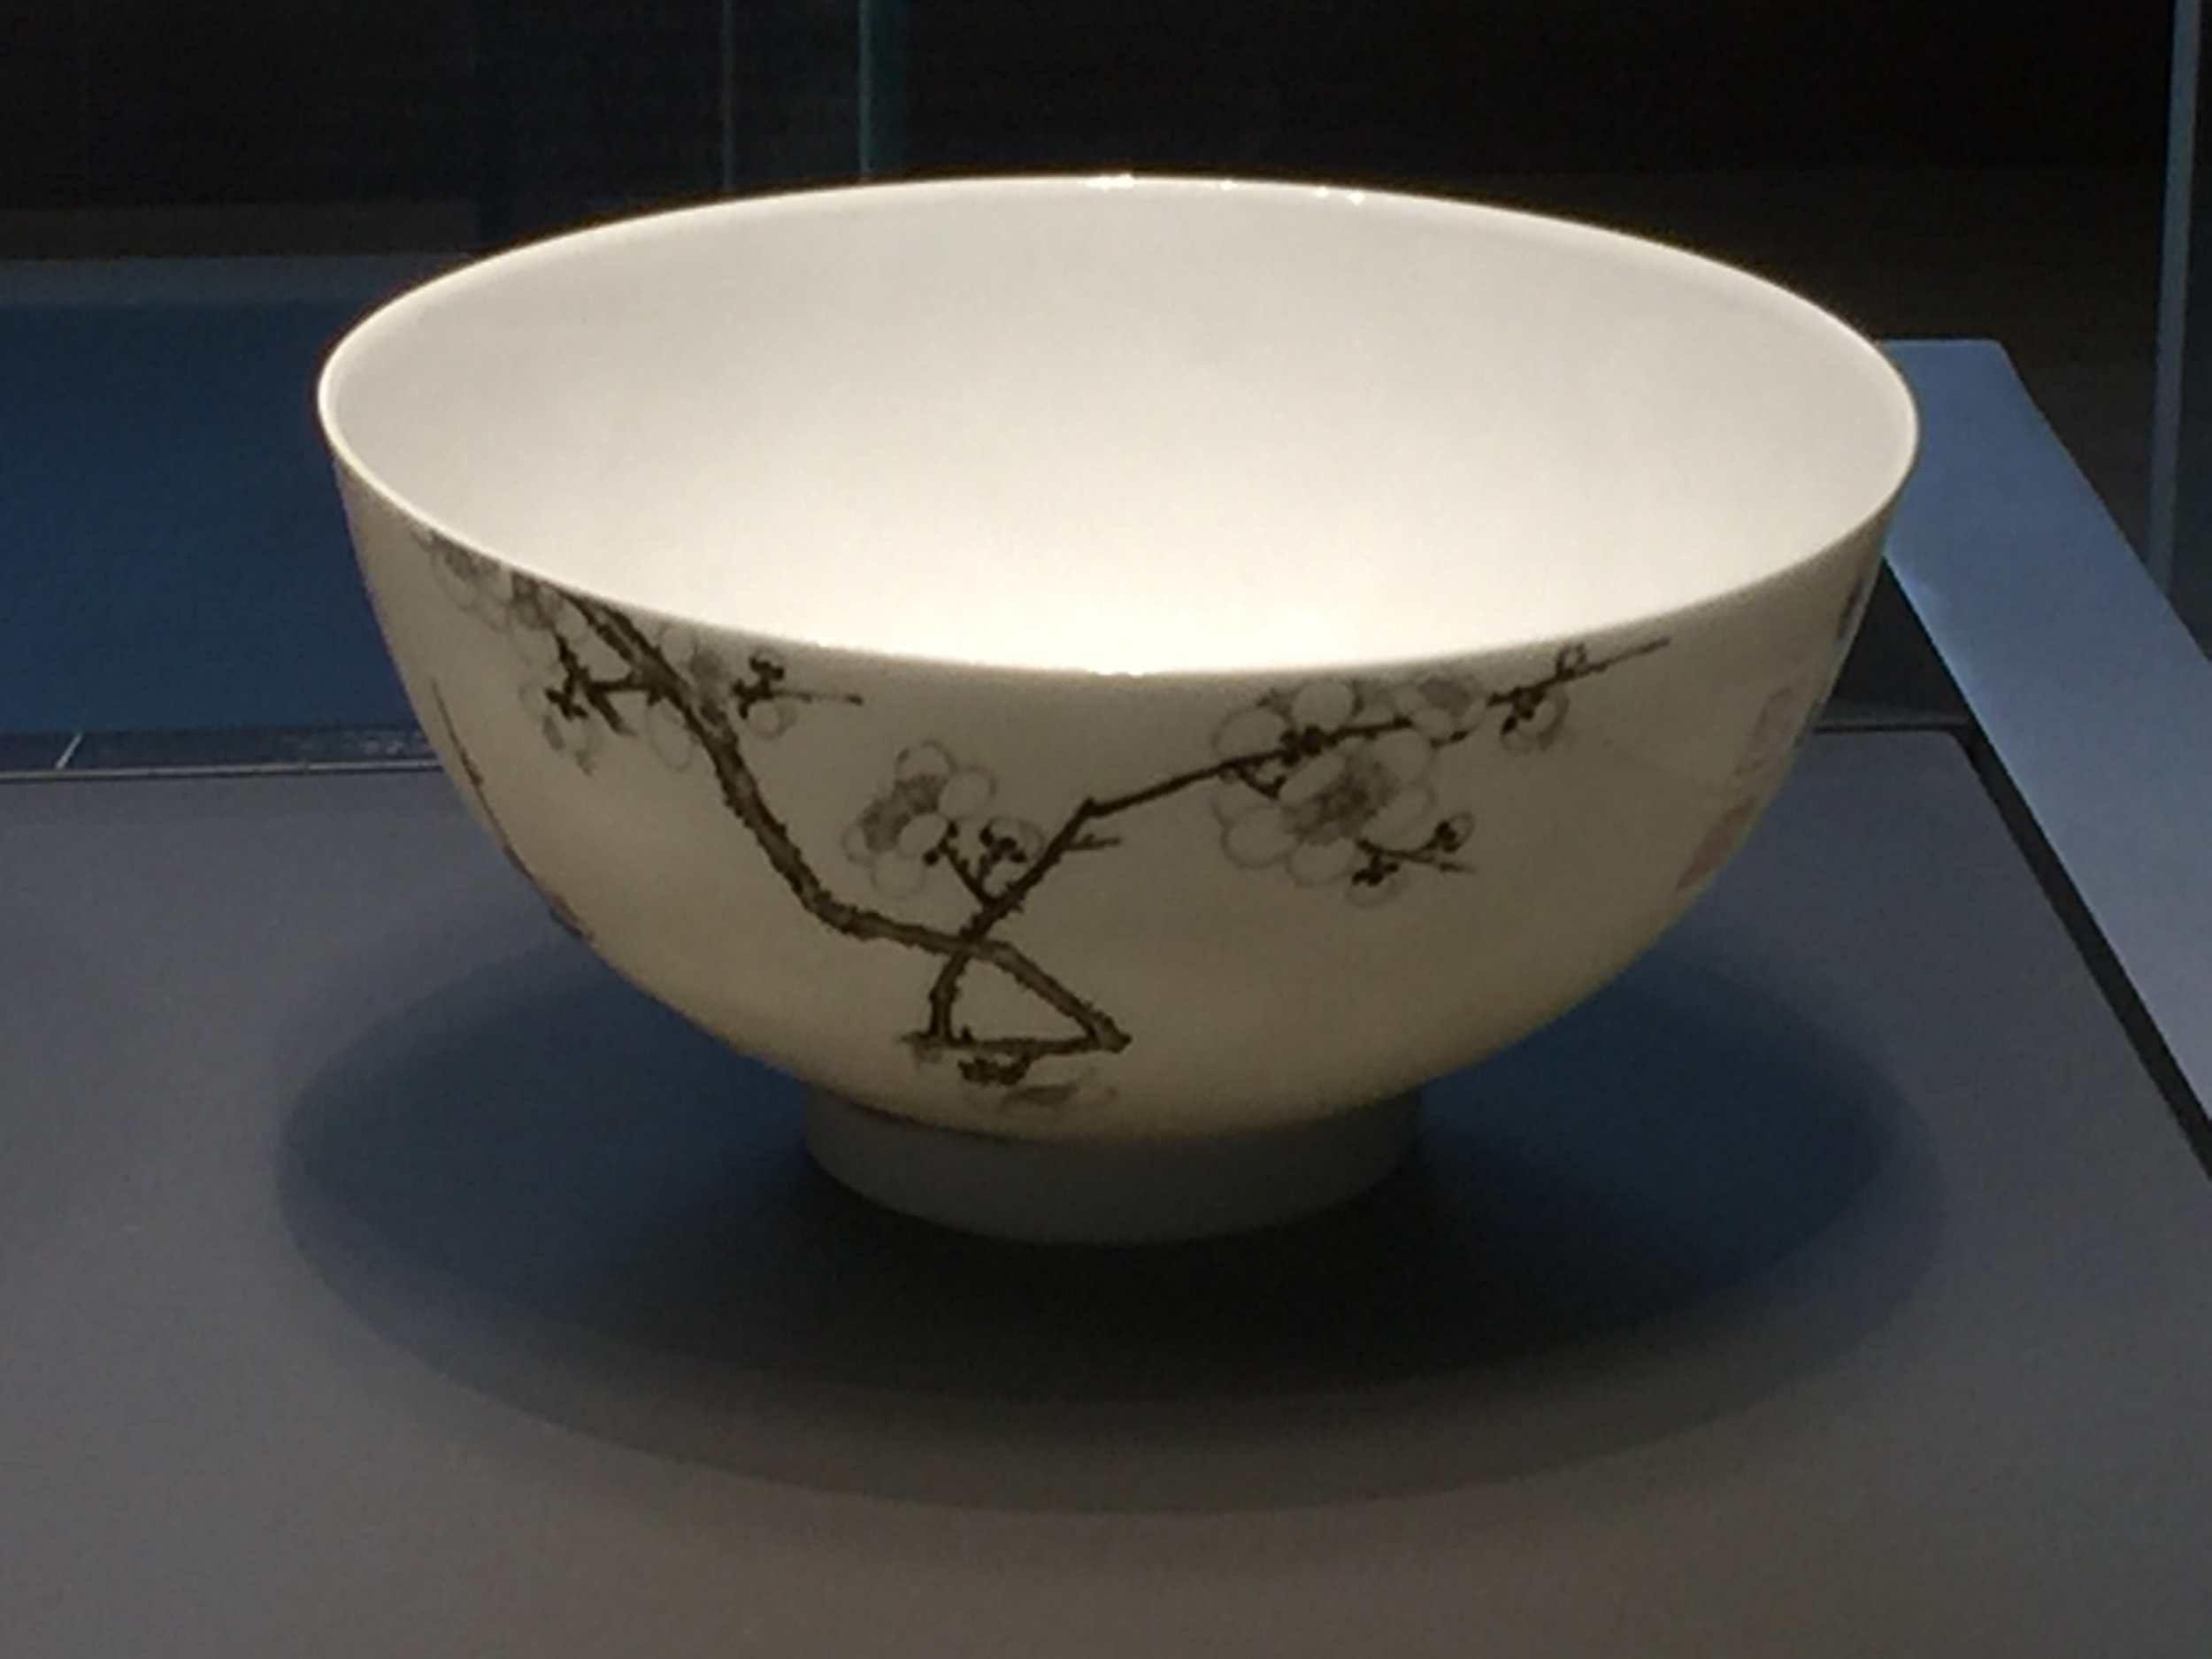 Chinese-Porcelain-British-Museum-Percival-David-jessewaugh.com-86.jpg